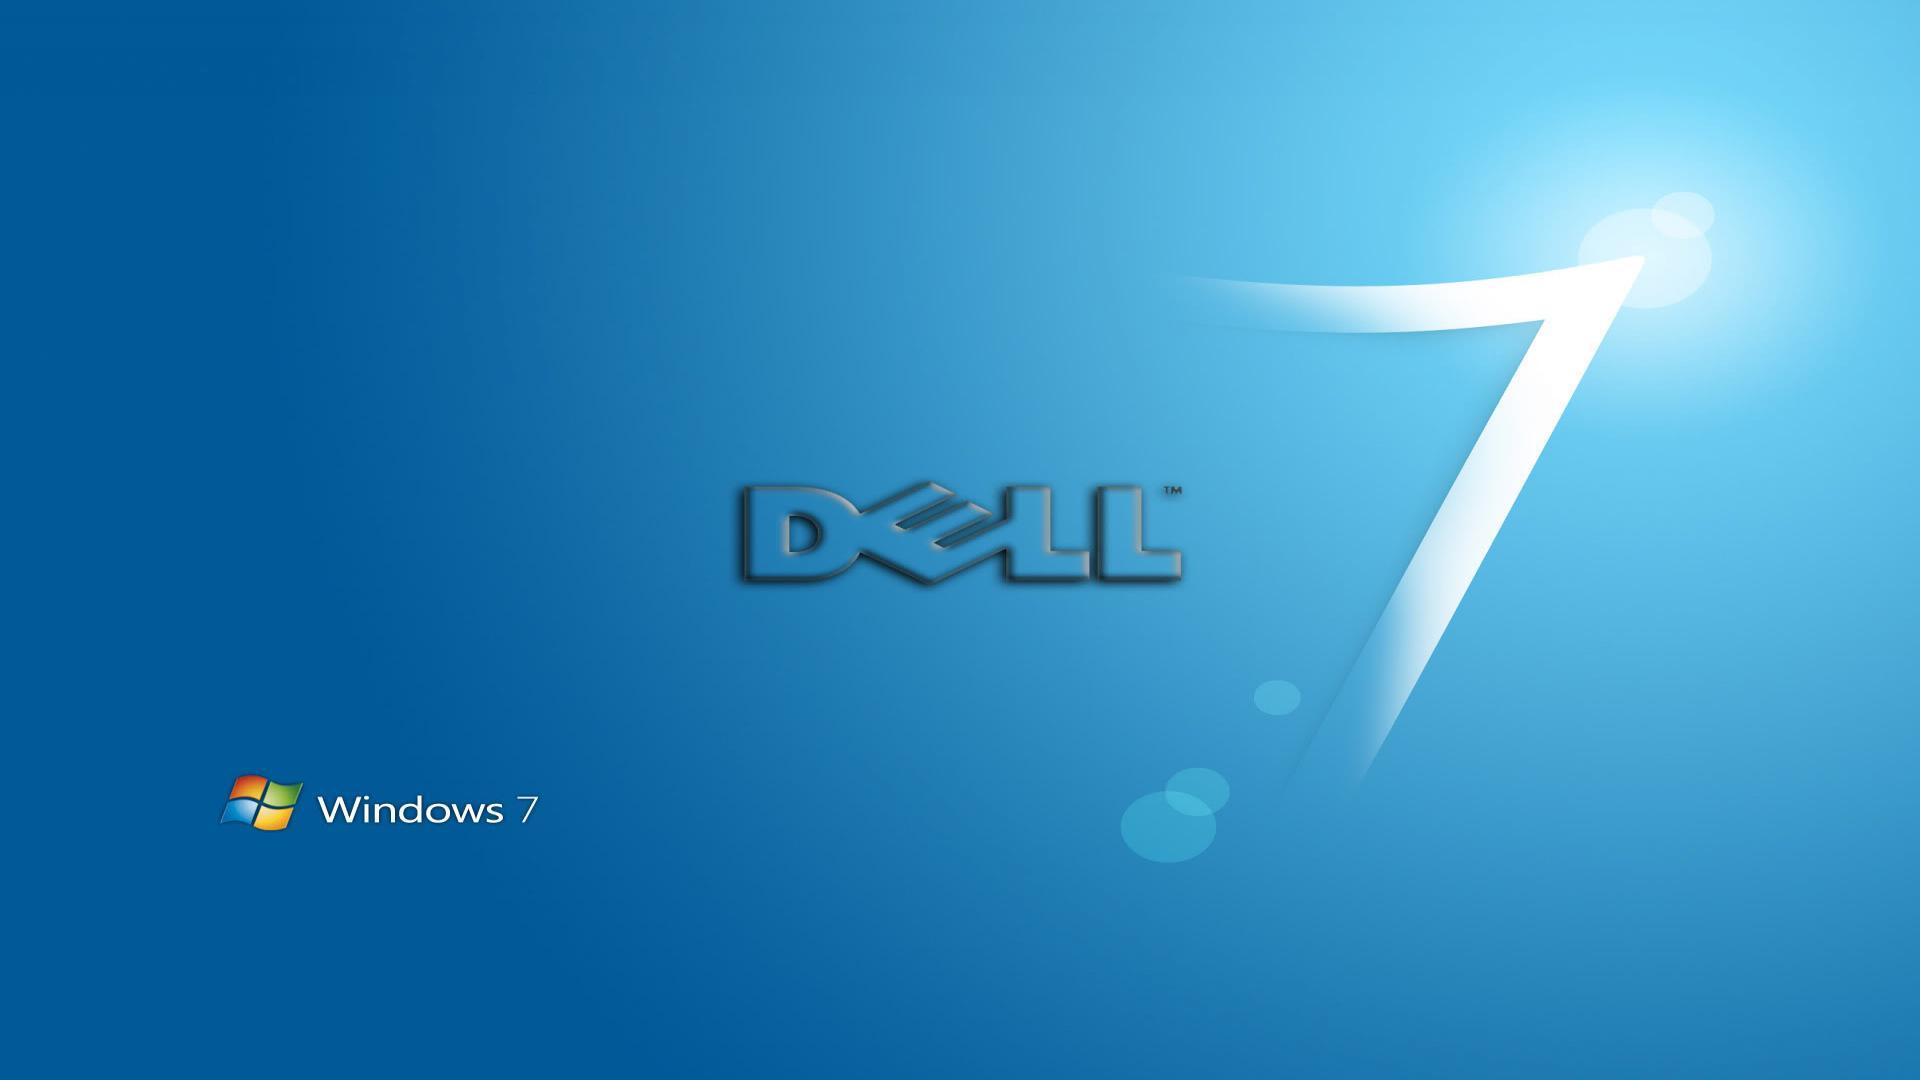 Windows 7 Ultimate wallpaper   1373957 1920x1080